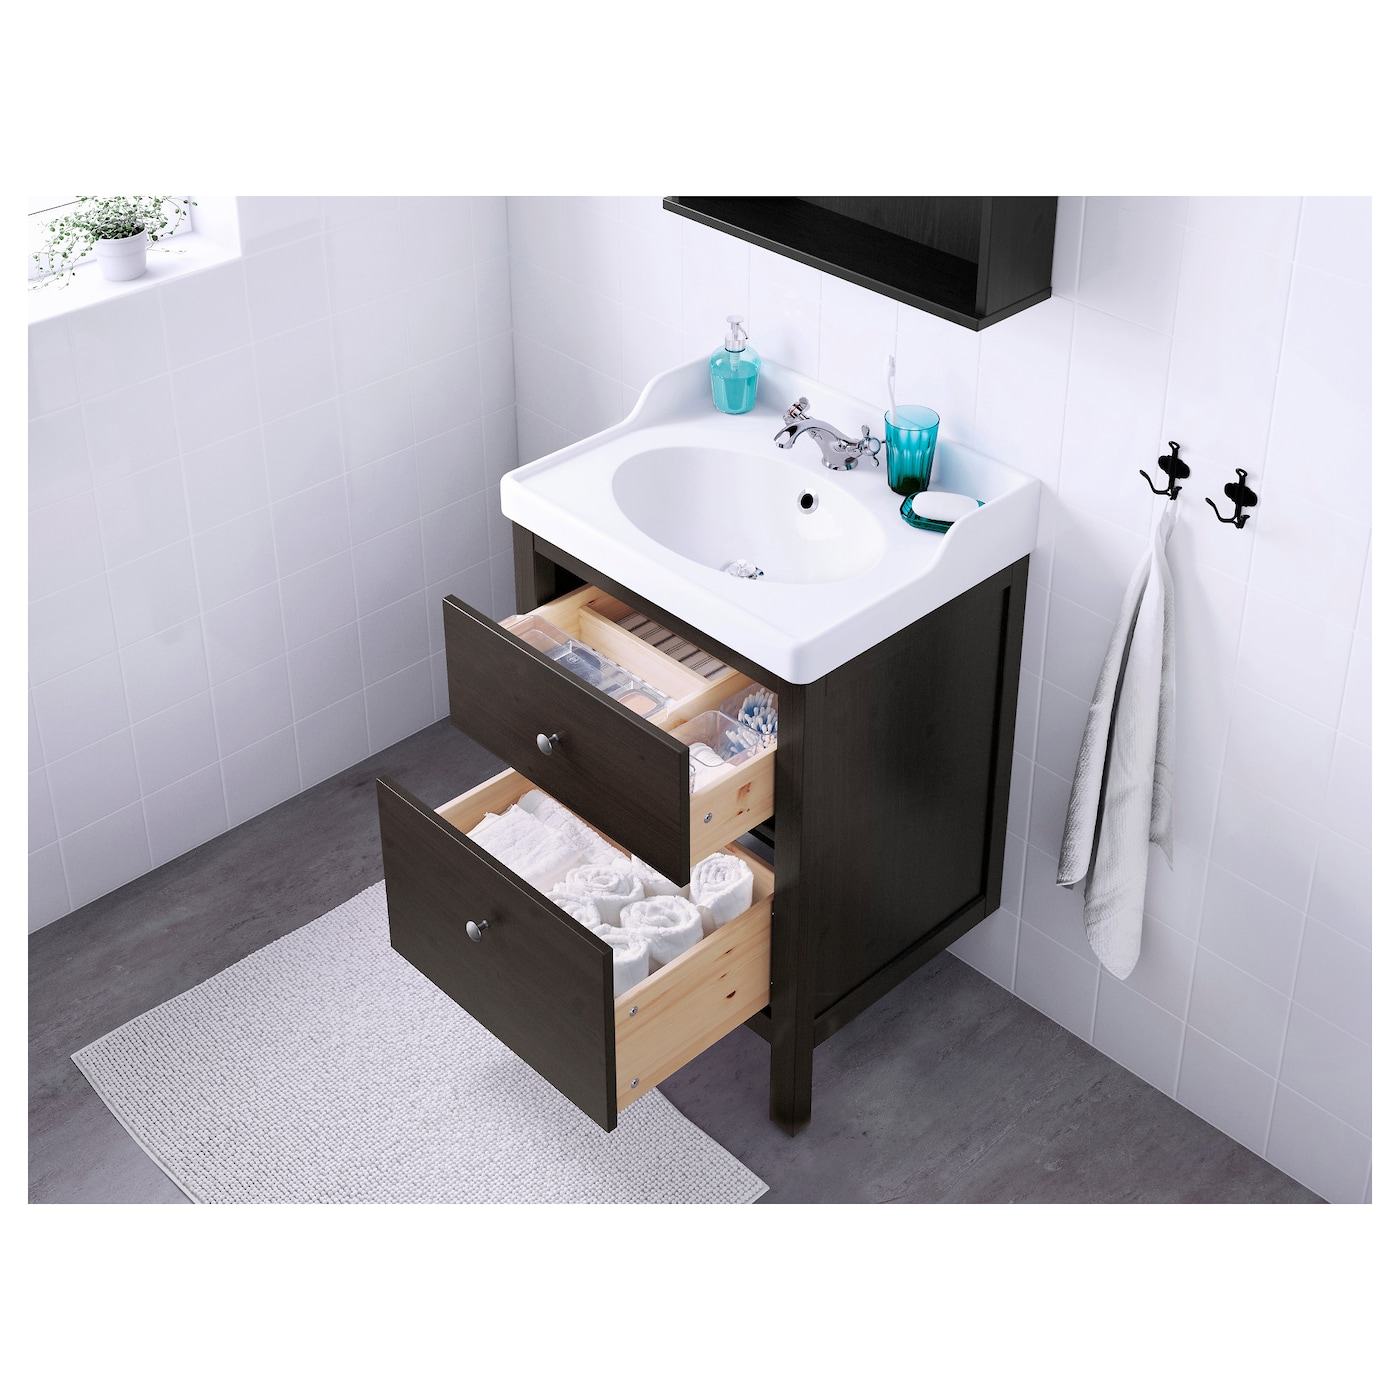 HEMNES RäTTVIKEN Wash stand with 2 drawers Black brown stain 60x49x89 cm IKEA